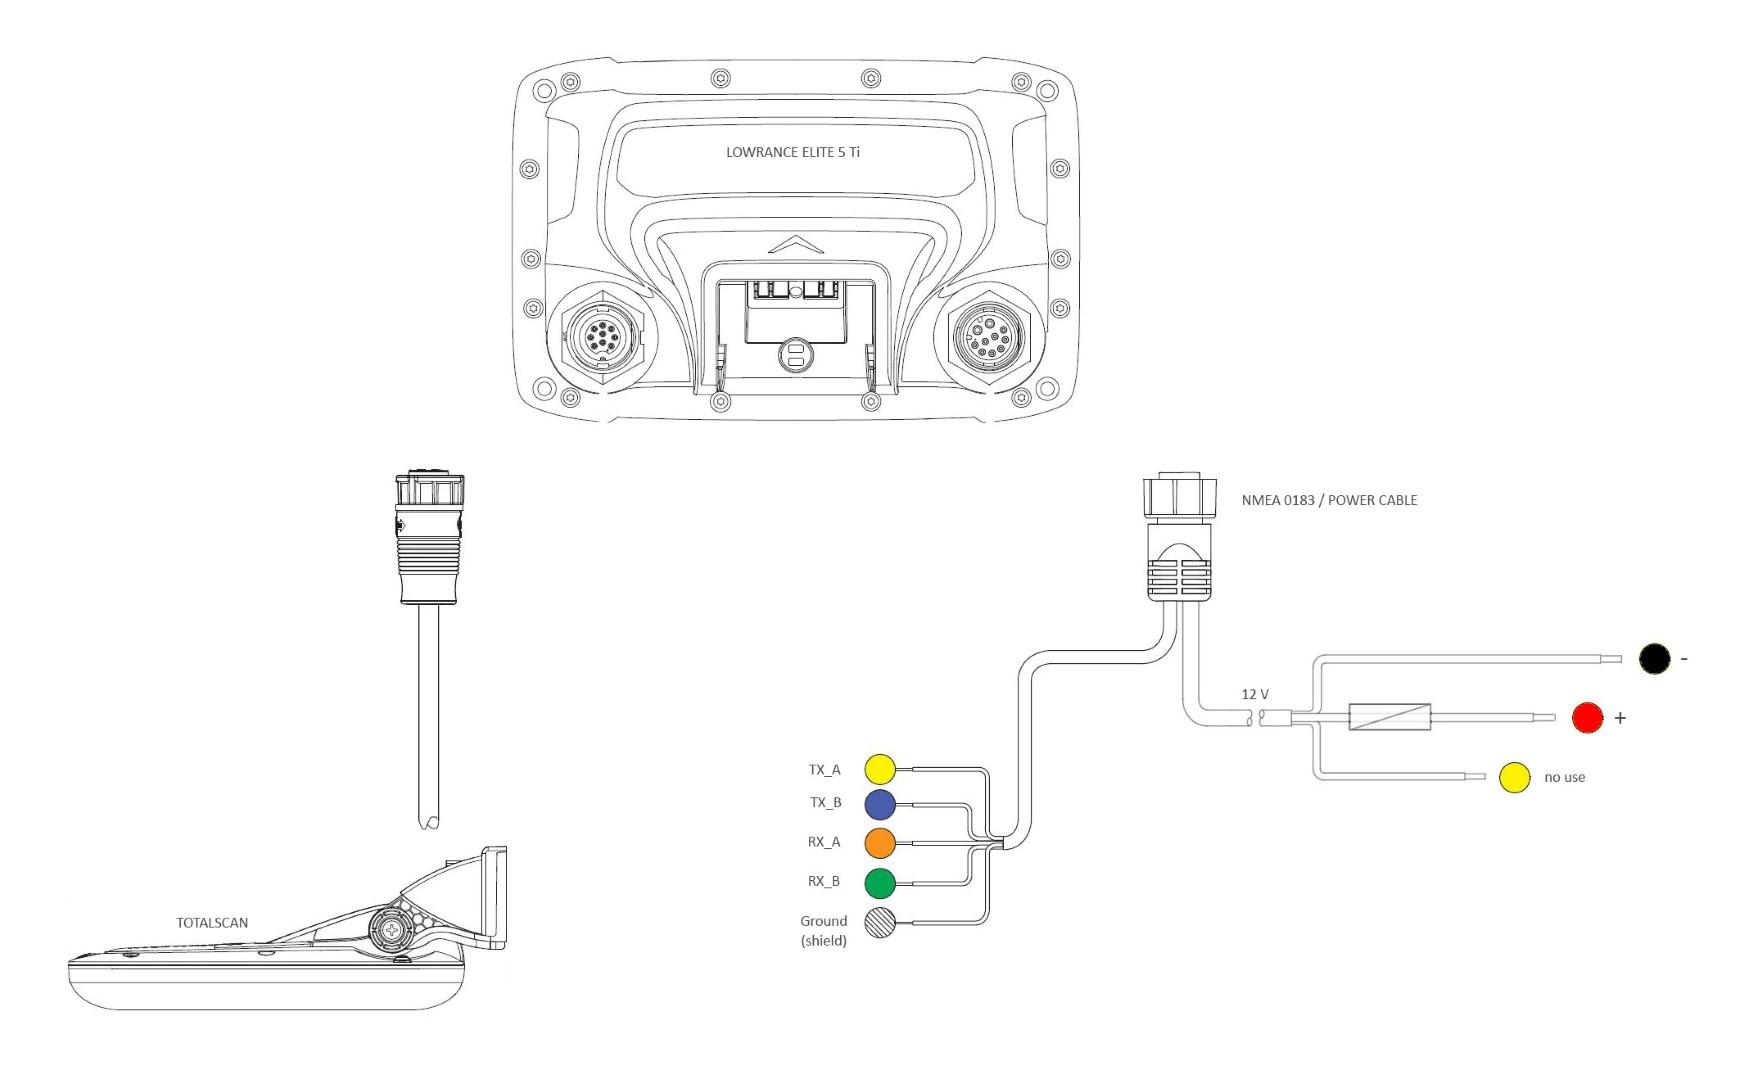 PixHawk3 and echosounder with NMEA output - ArduBoat ... on lowrance plug diagram, lowrance power diagram, lowrance side imaging, lowrance side scan sonar, lowrance structure scan wiring, lowrance logo, lowrance fish finders, lowrance structure scan installation, data mapping diagram, lowrance handheld gps, lowrance antenna, lowrance hds wiring, lowrance networking diagram, lowrance hds 7 structure scan,